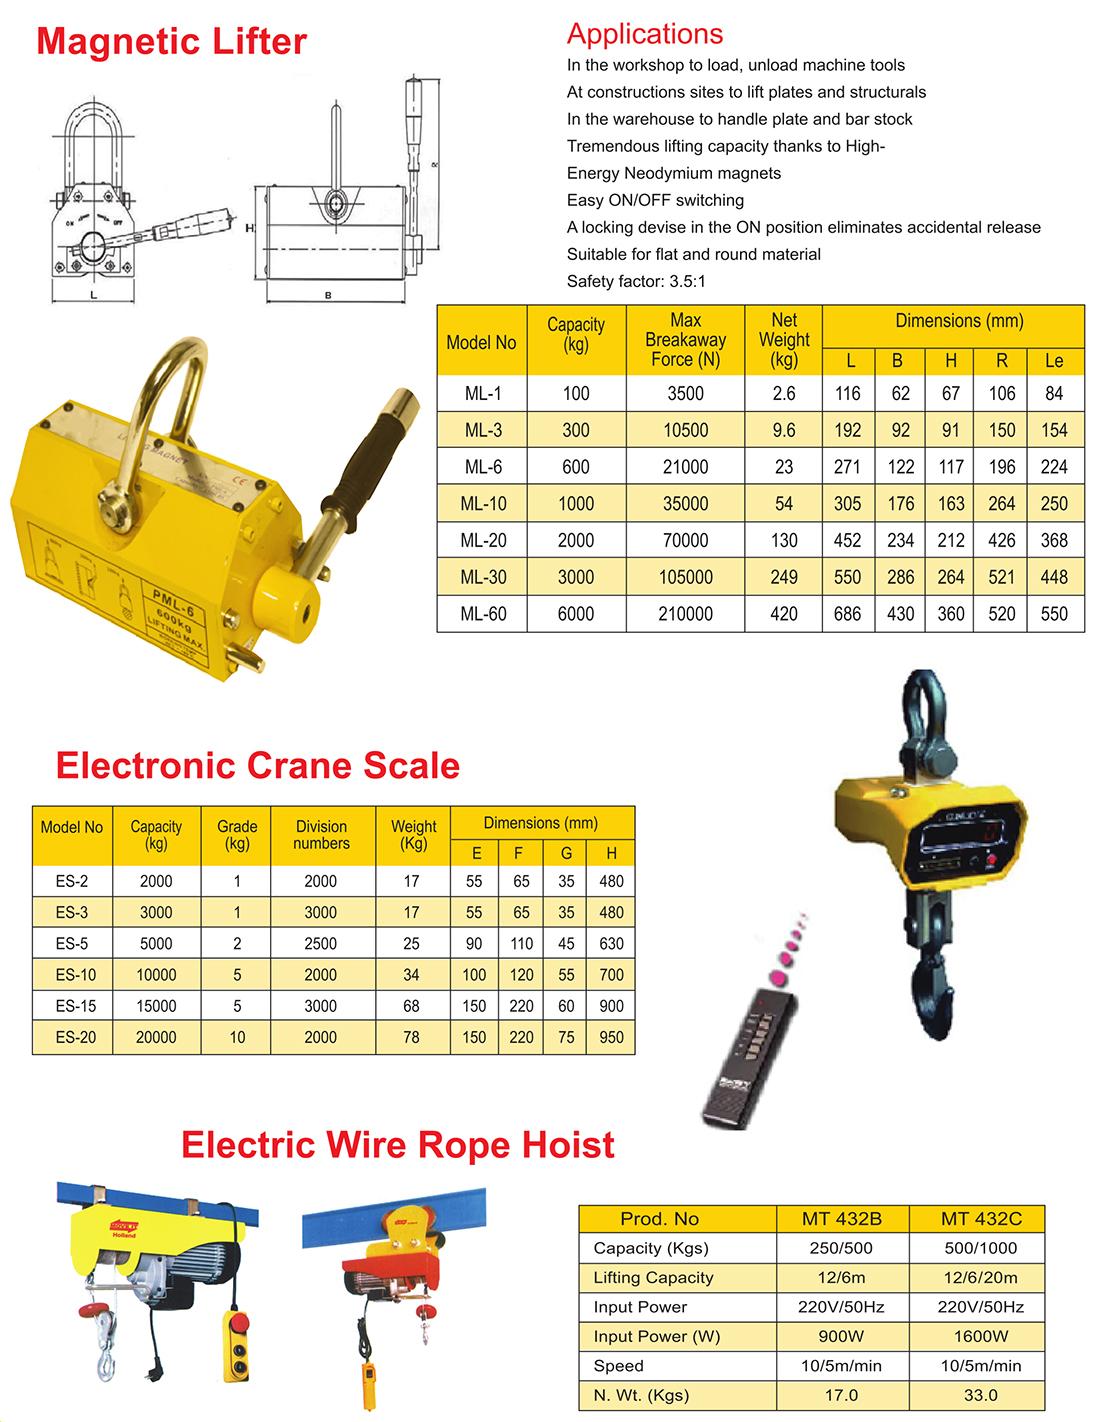 hoist-electric